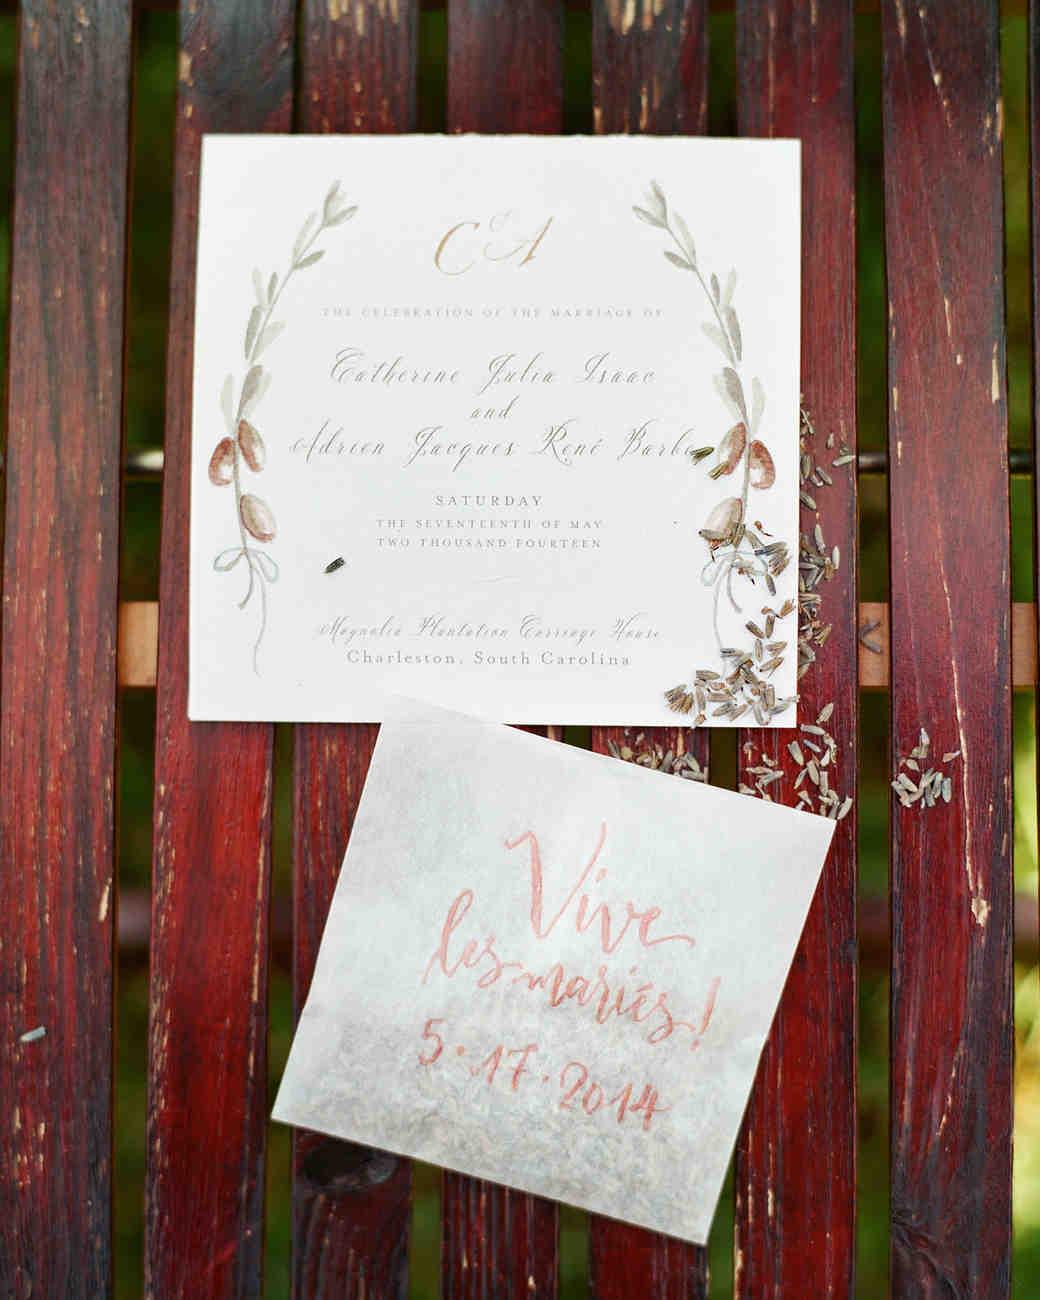 catherine-adrien-wedding-program-0540-s111414-0814.jpg